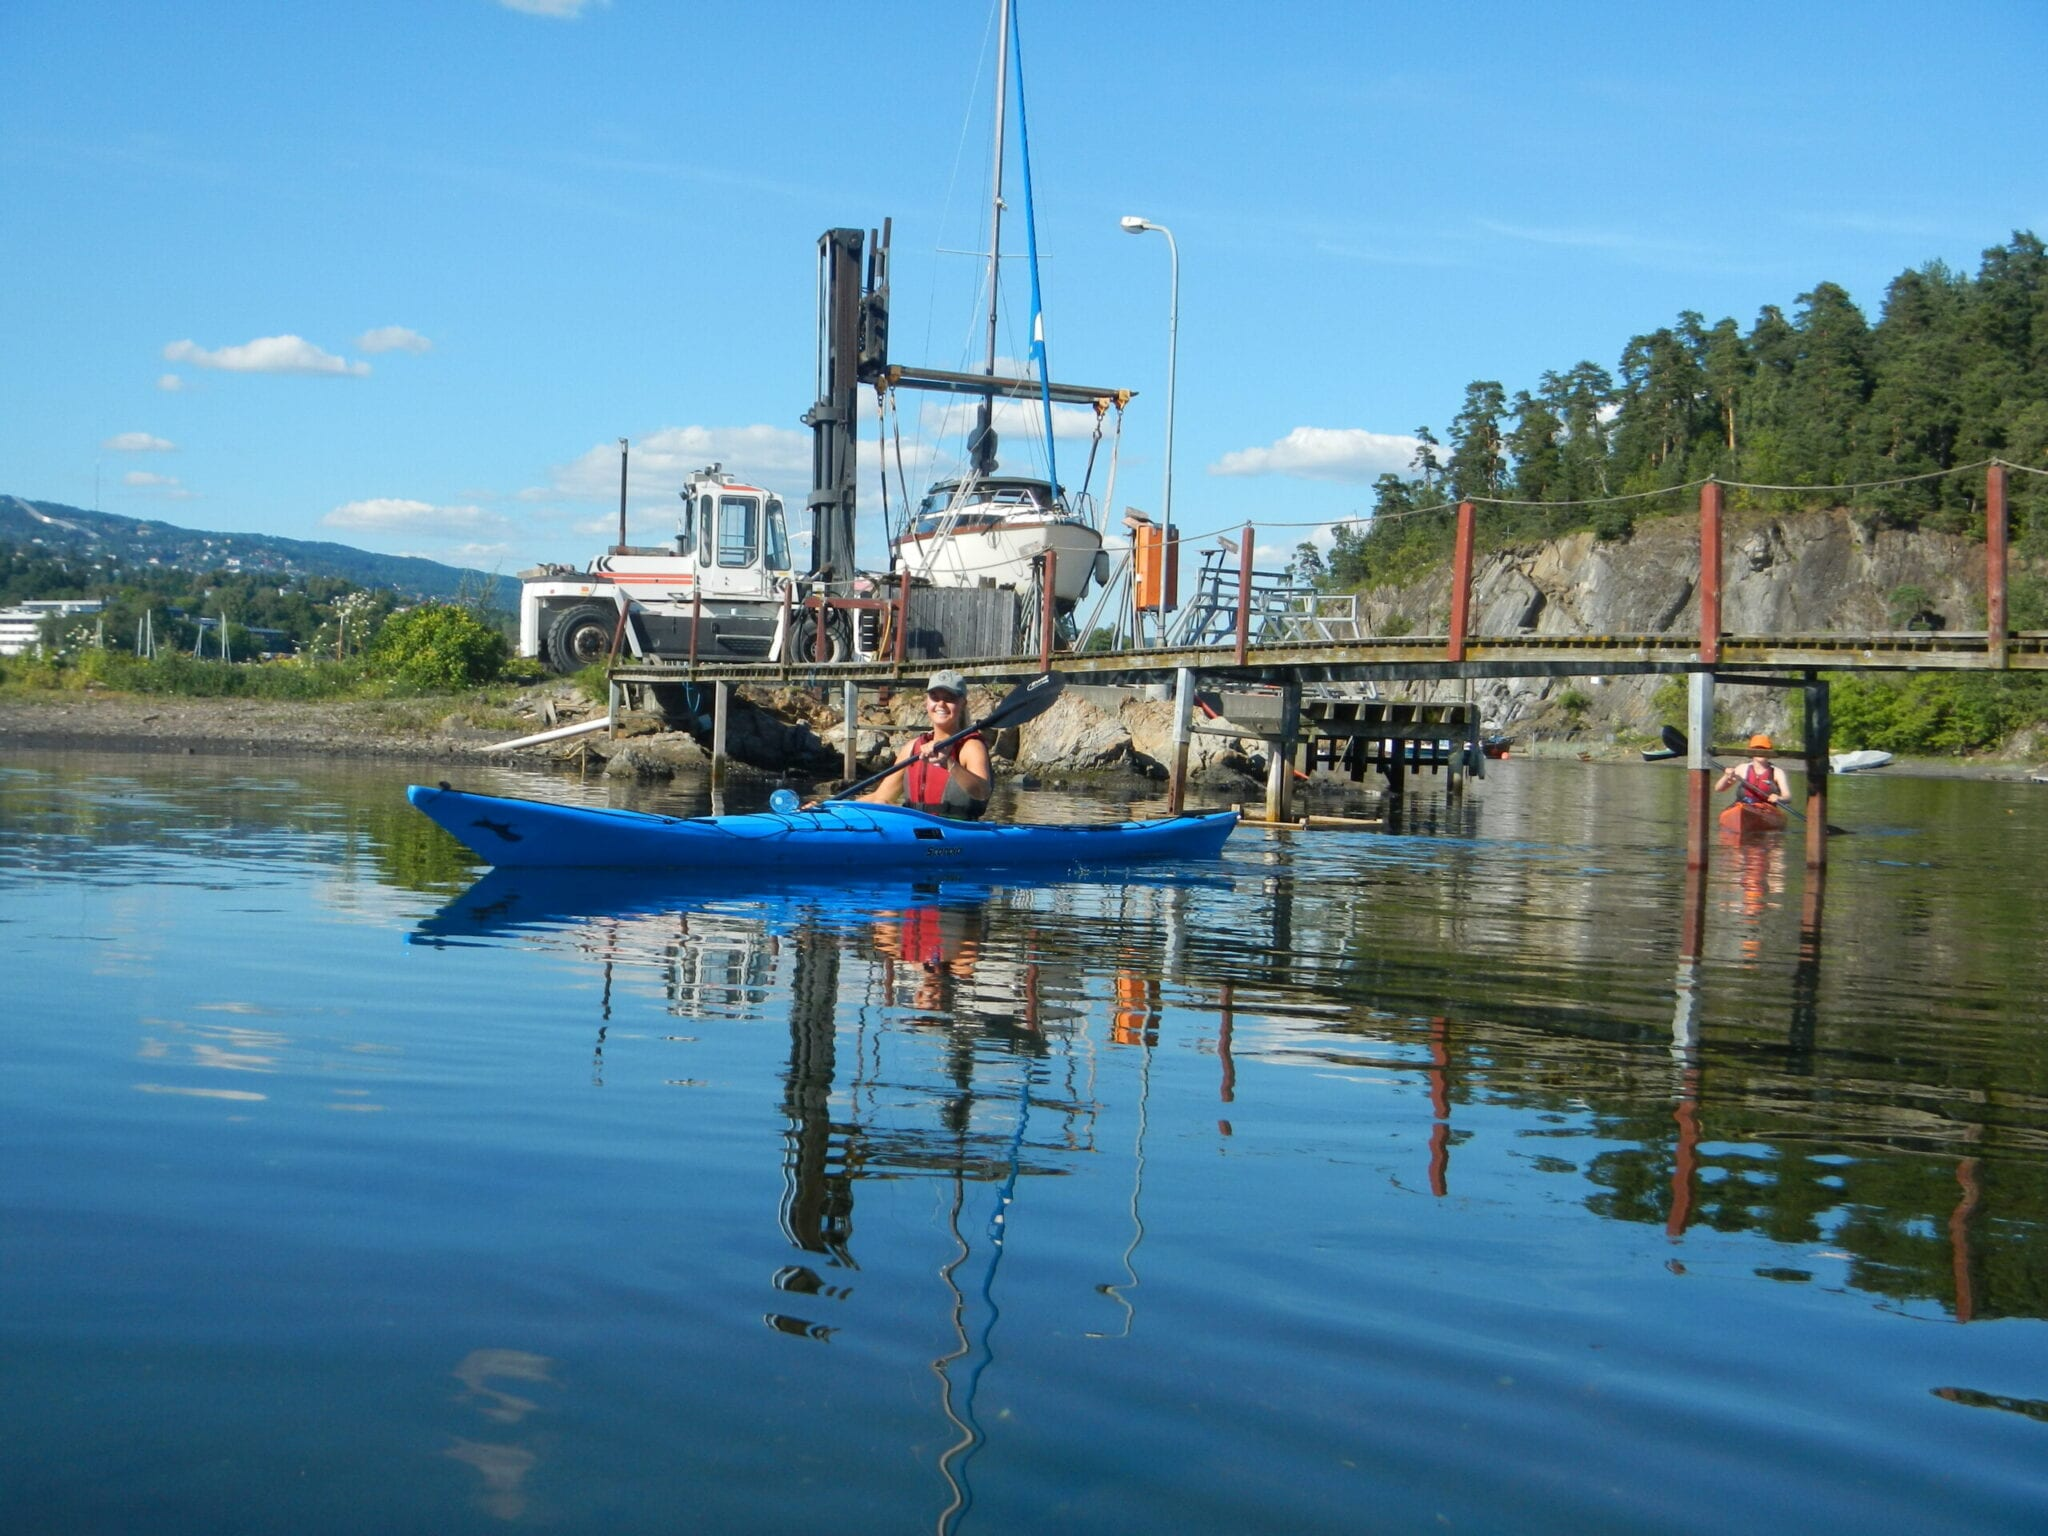 Kayaking under the bridge